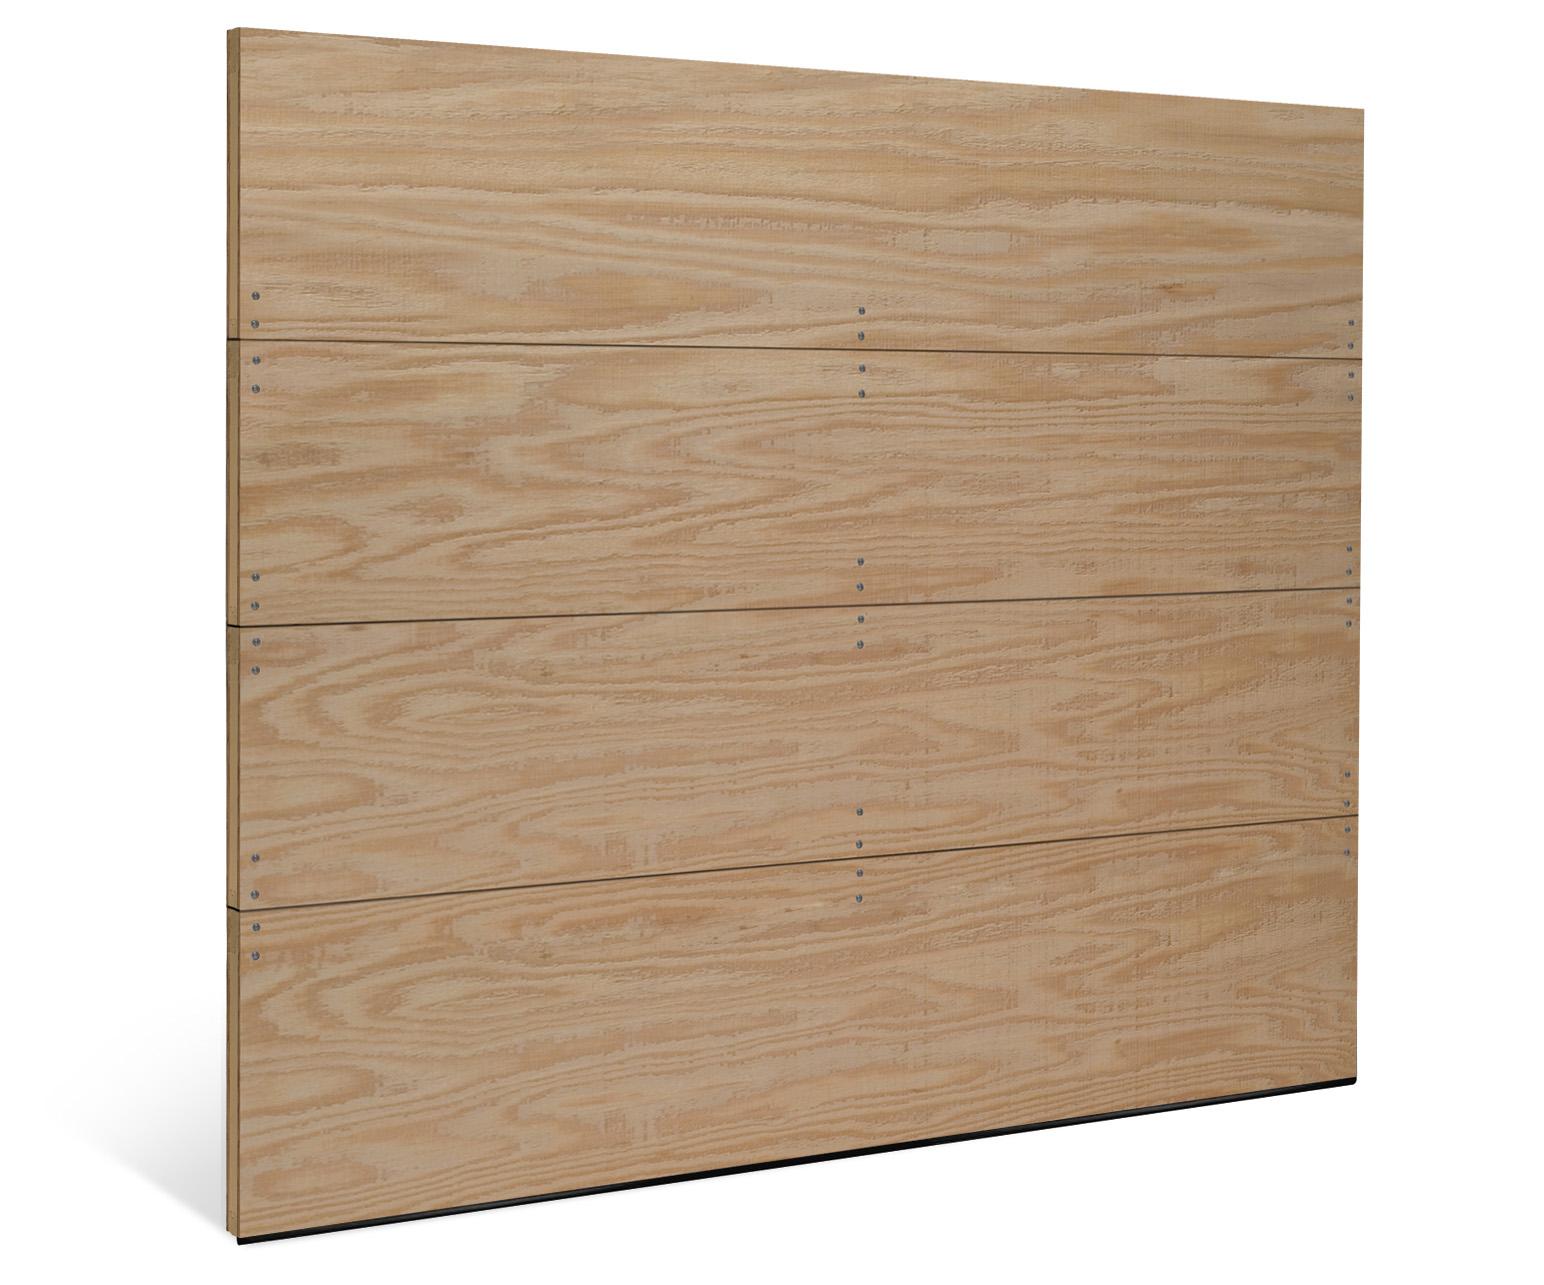 Flush Panel Wood Garage Door One Clear Choice Garage